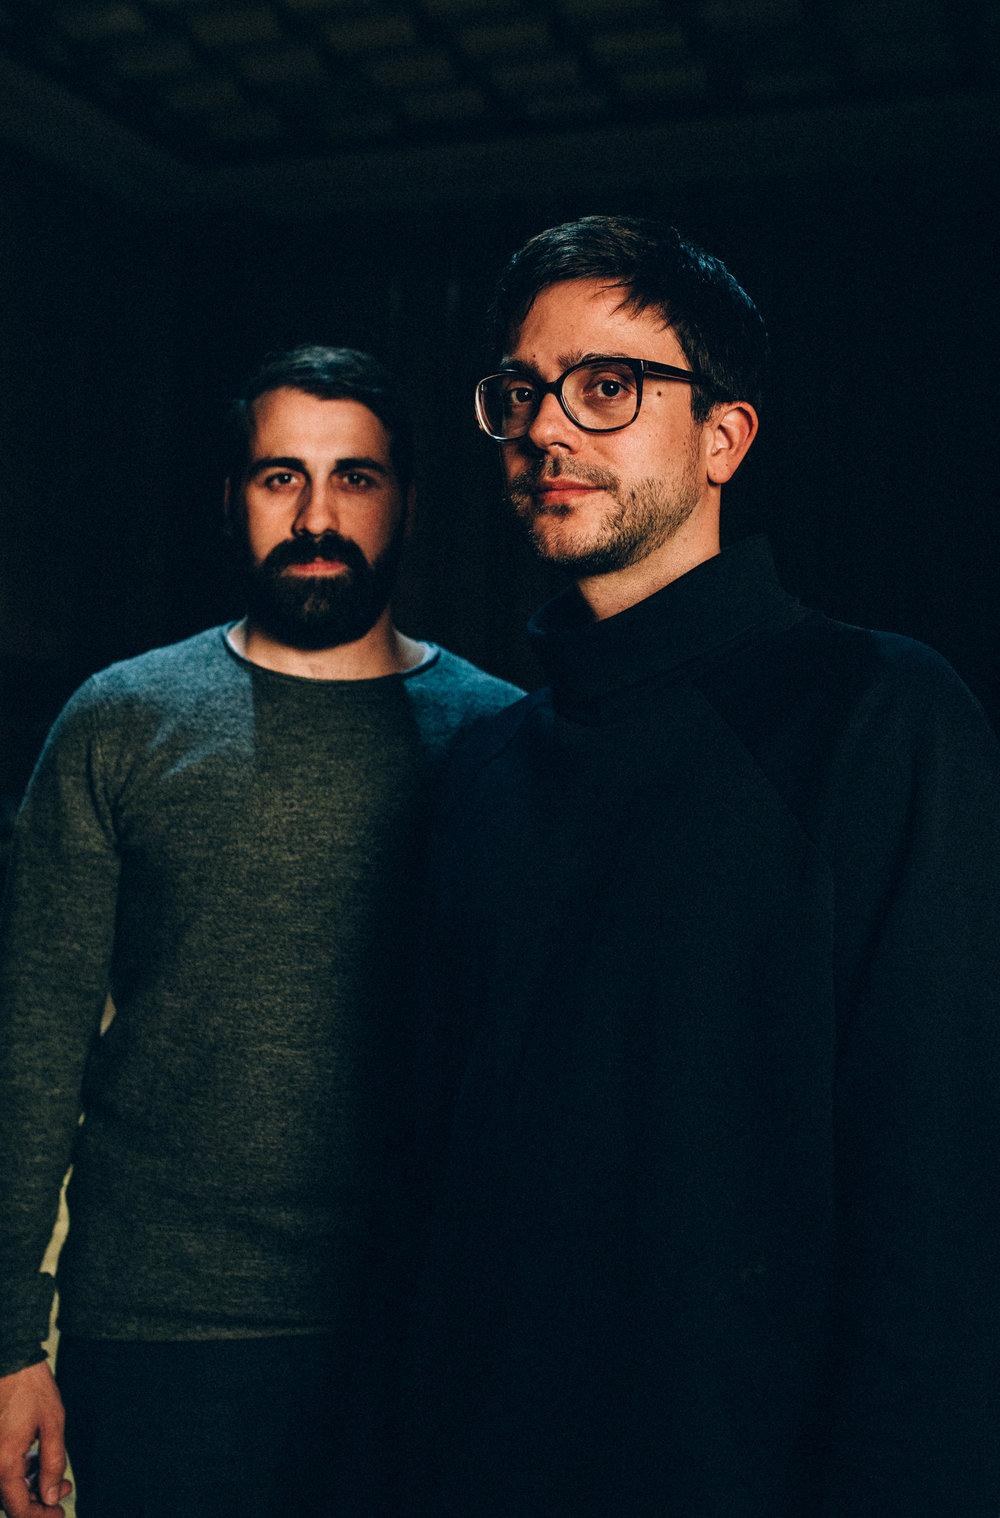 Grandbrothers-Funkhaus-©-by-Nils-Lucas-2017_W3A9353.jpg